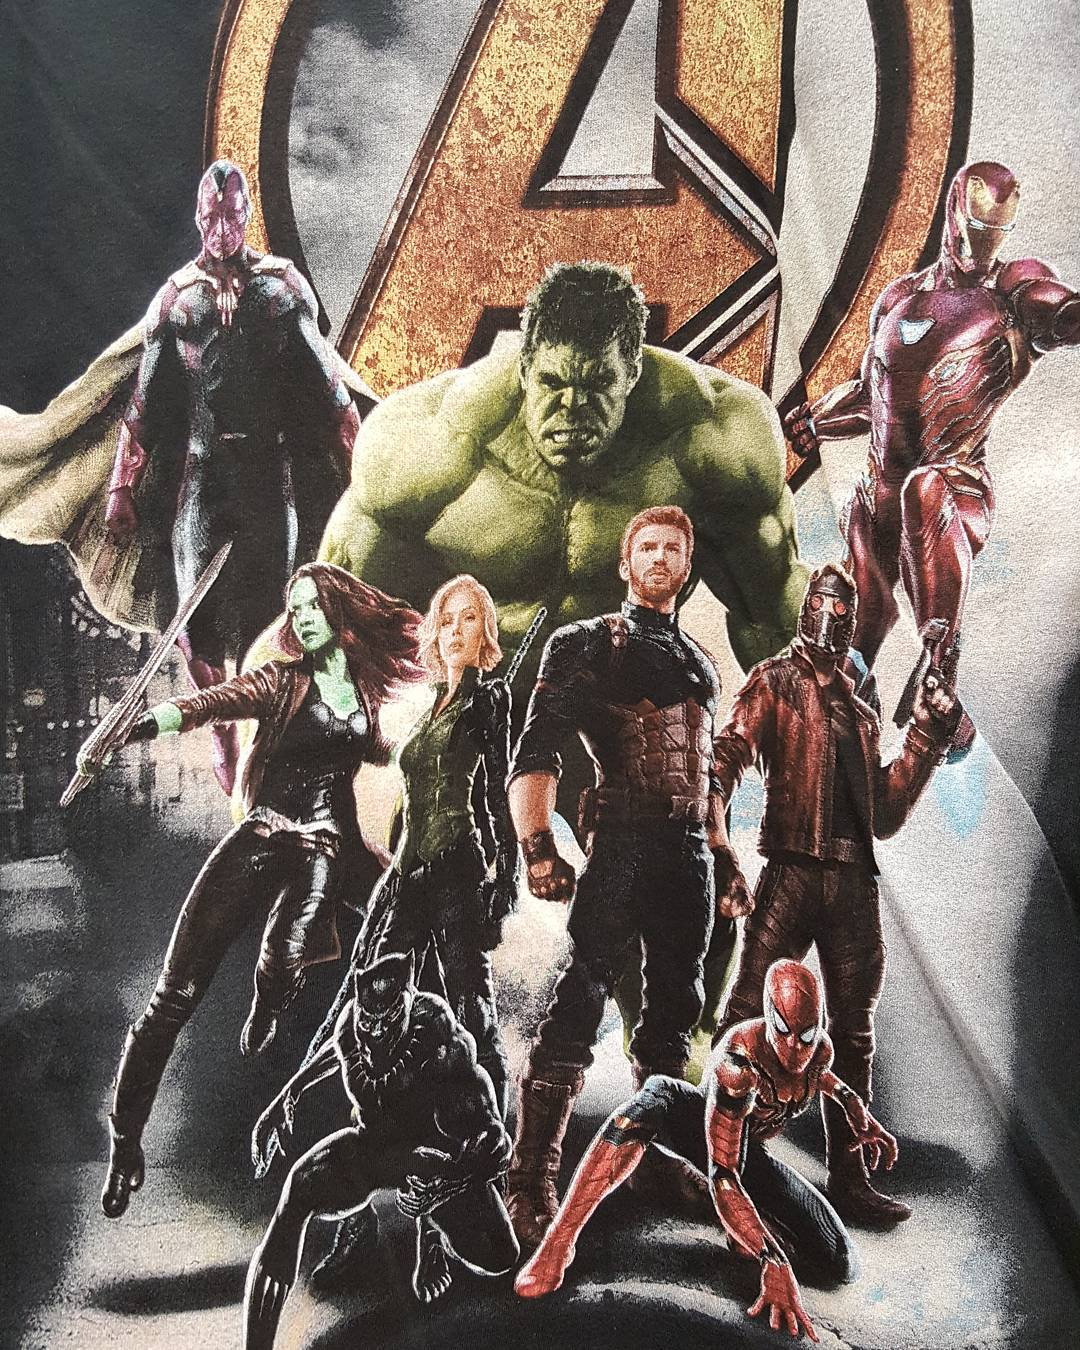 Nuevo arte promocional para Avengers: Infinity War superficies